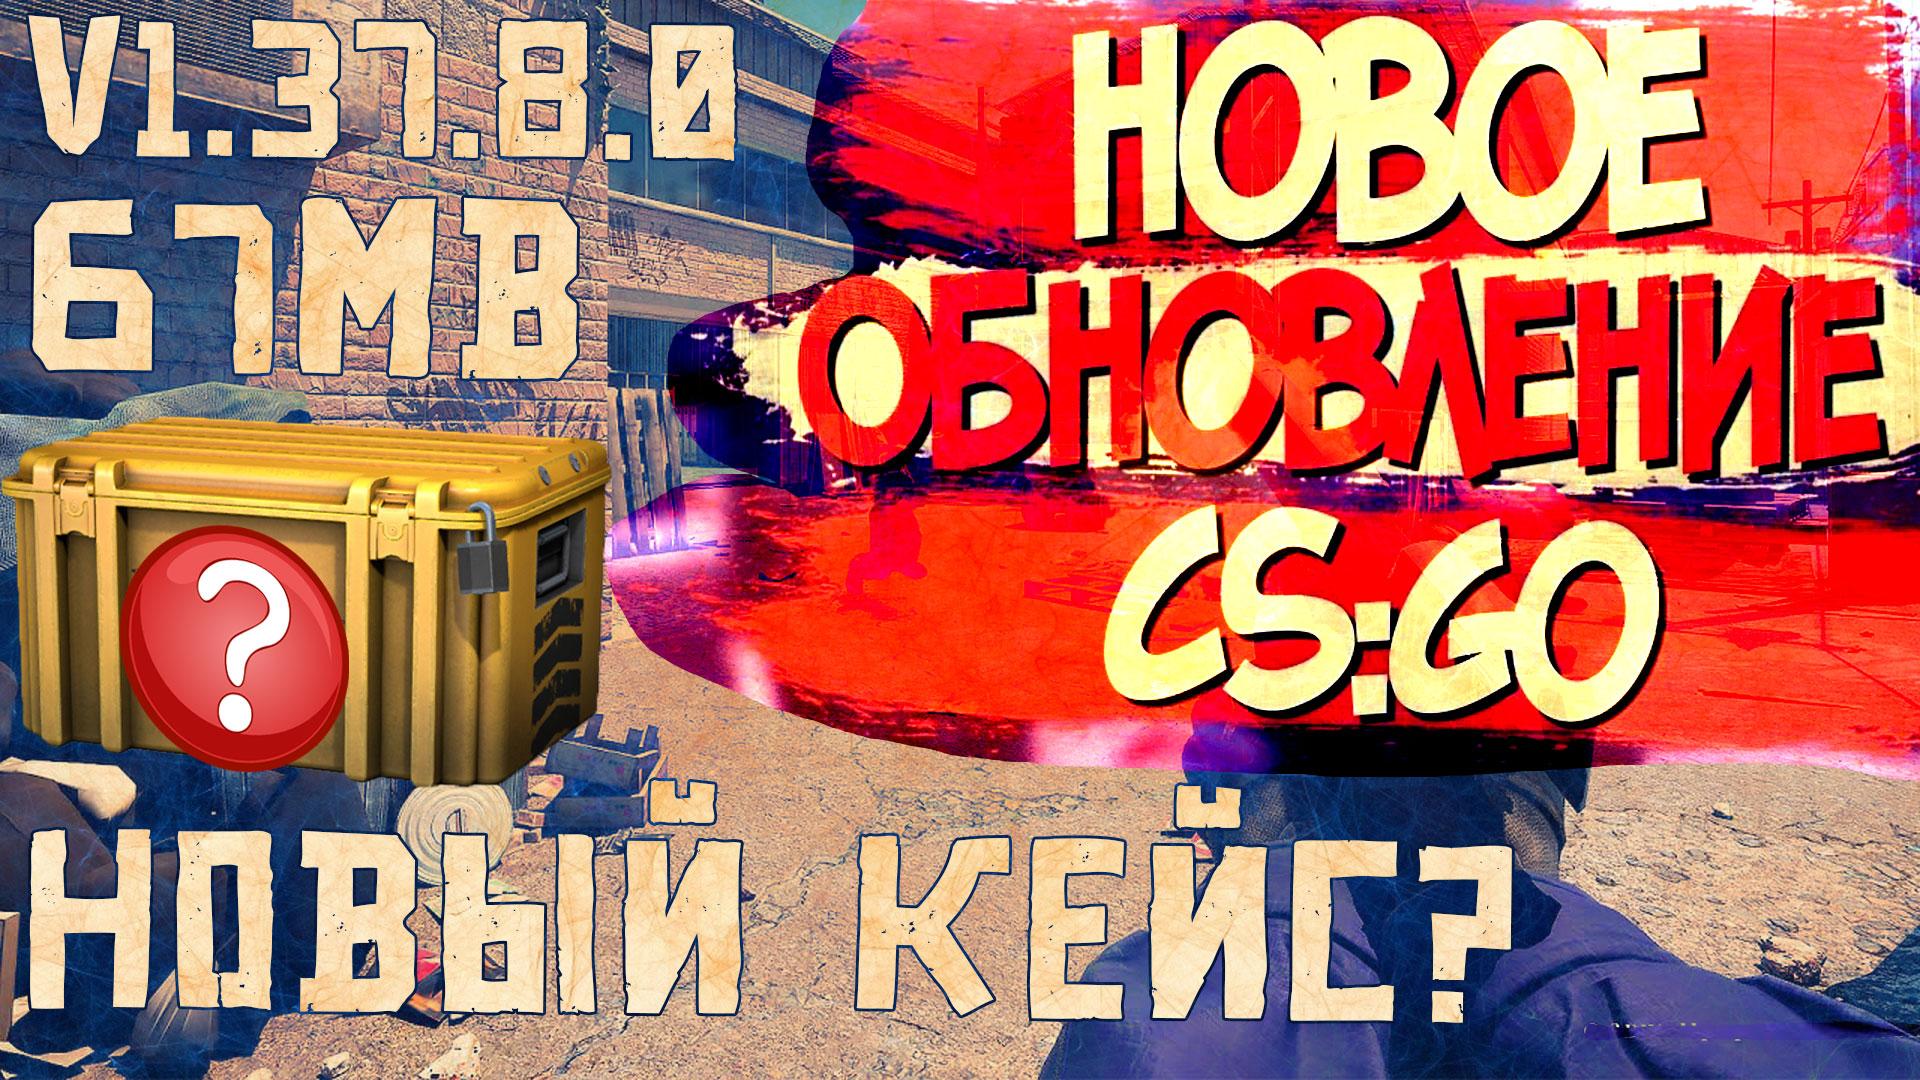 Dust2, Скины, Обновление, Александр «S1mple» Костылев, Карты, Counter-Strike: Global Offensive, Патчи в CS:GO